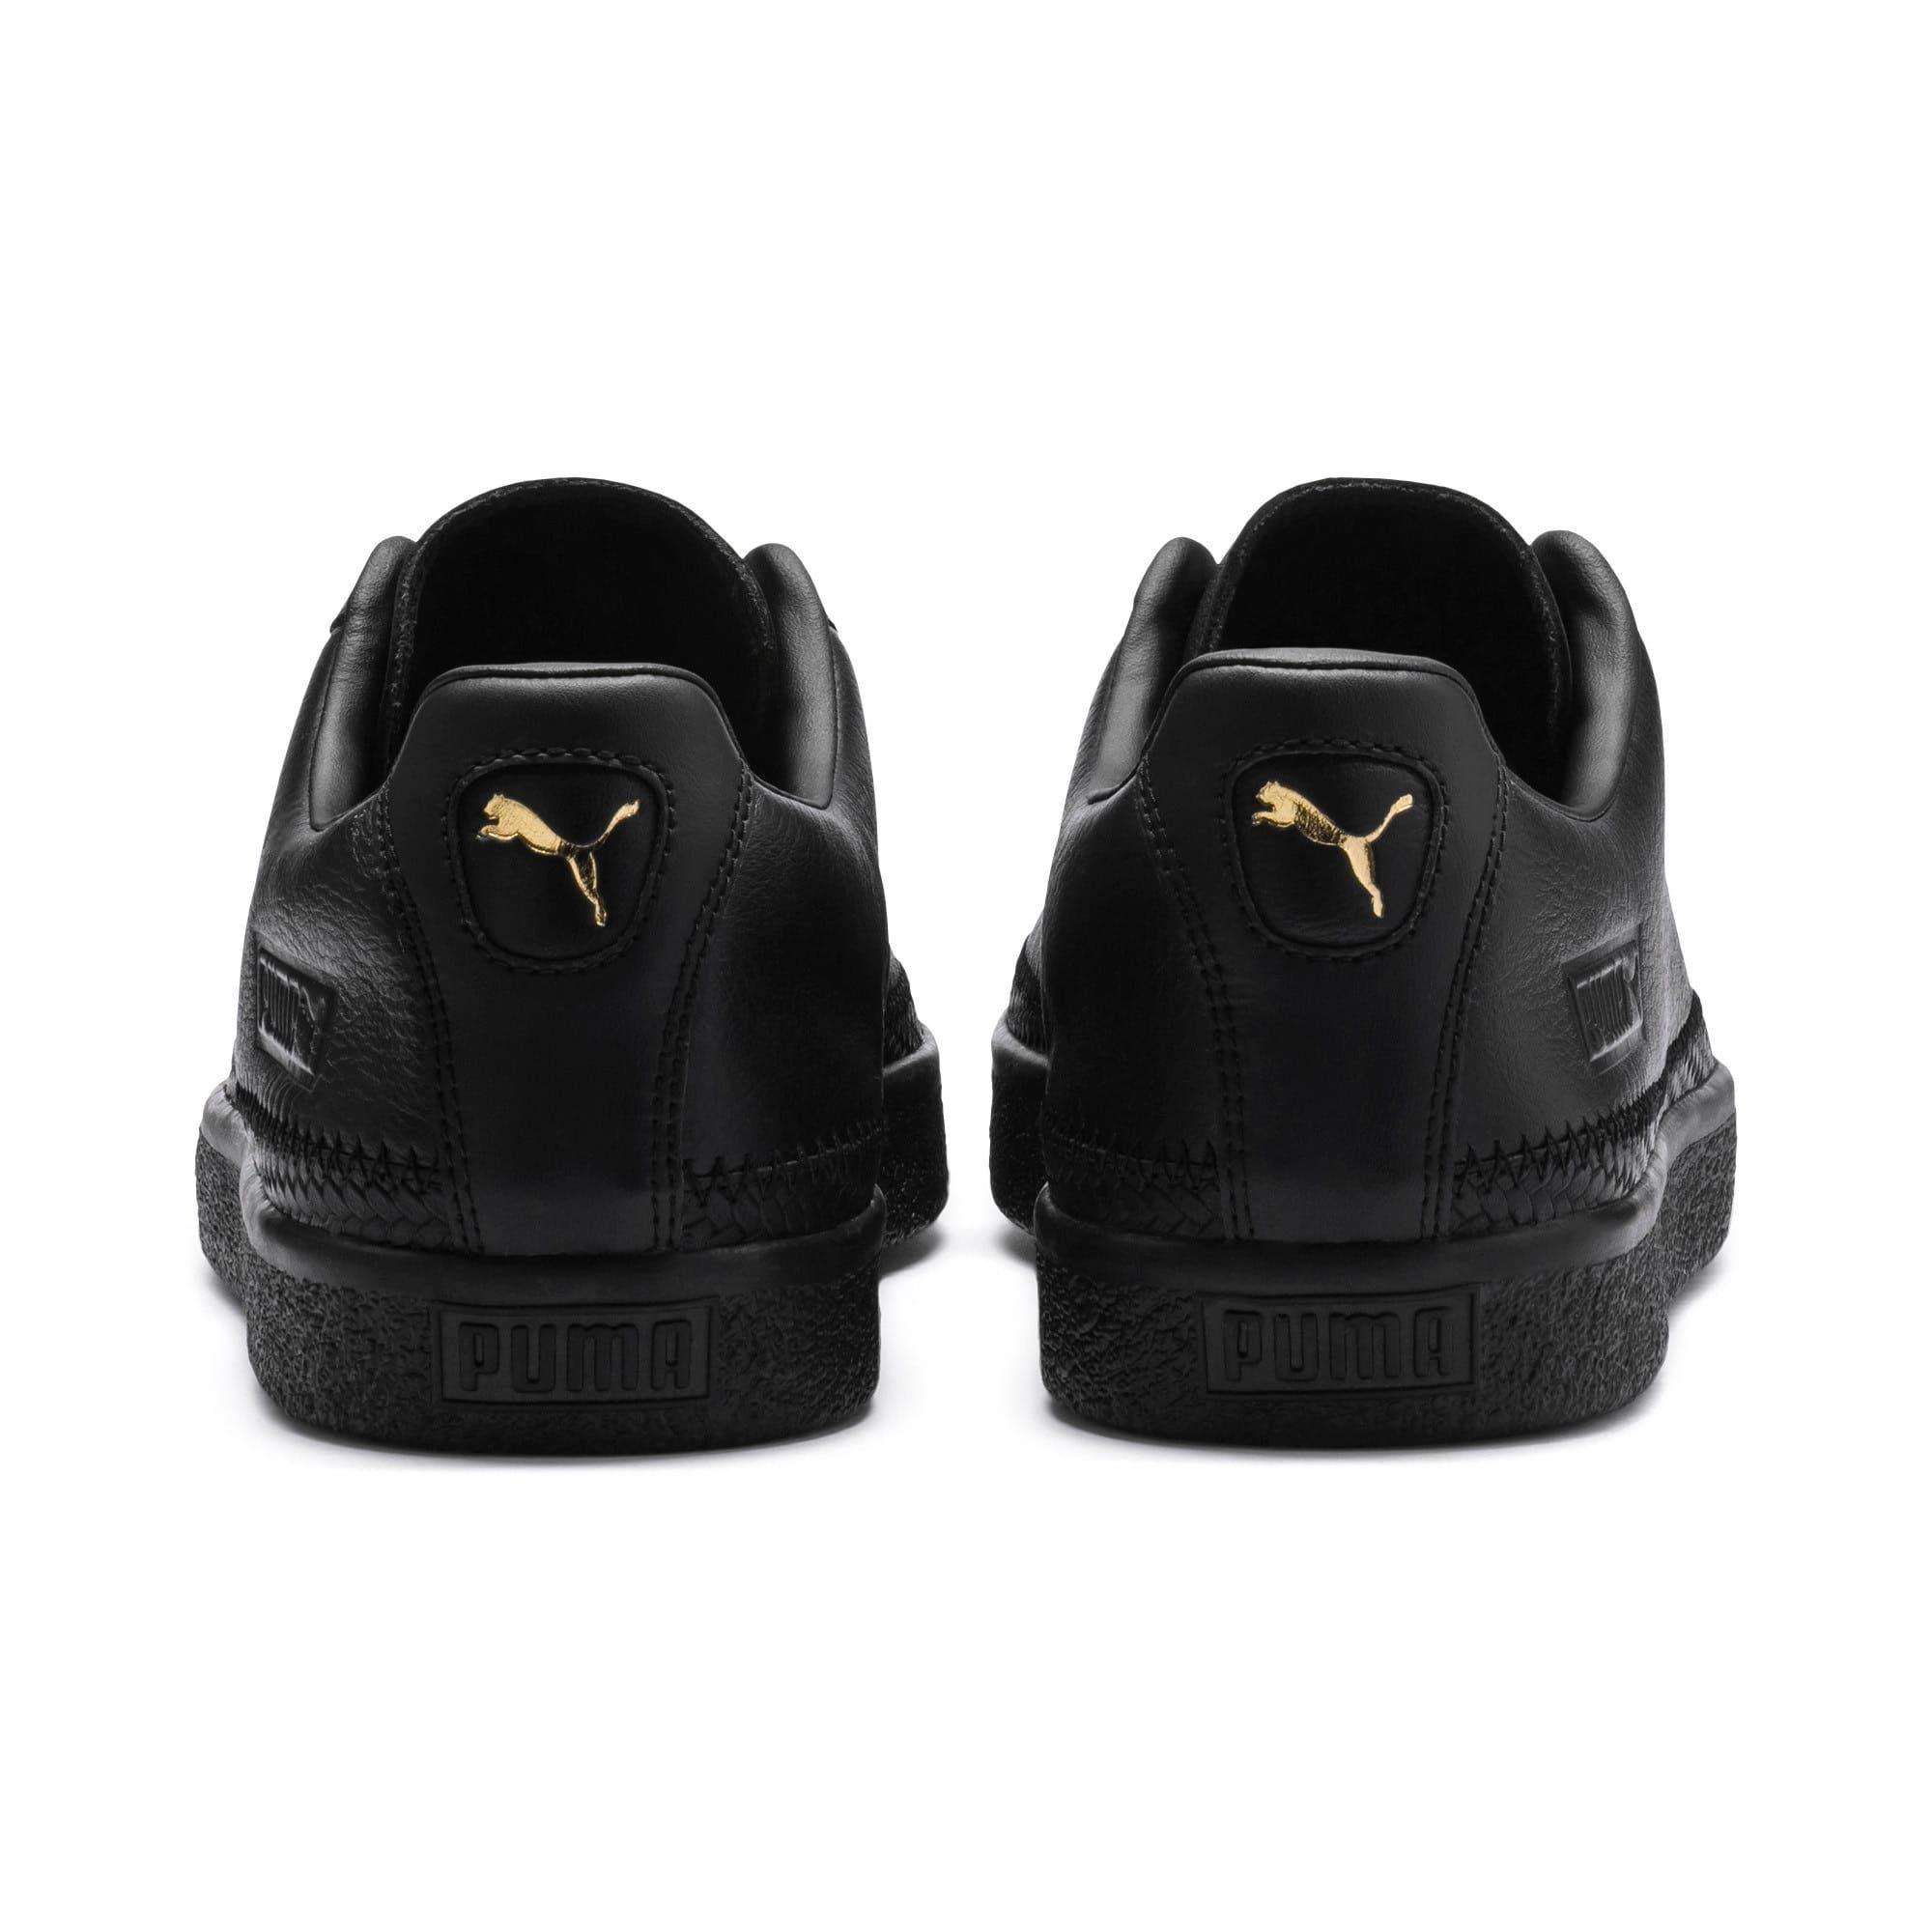 Puma Basket Trim Shoe Sneakers In Black Gold Size 3 5 Chaussure Basket